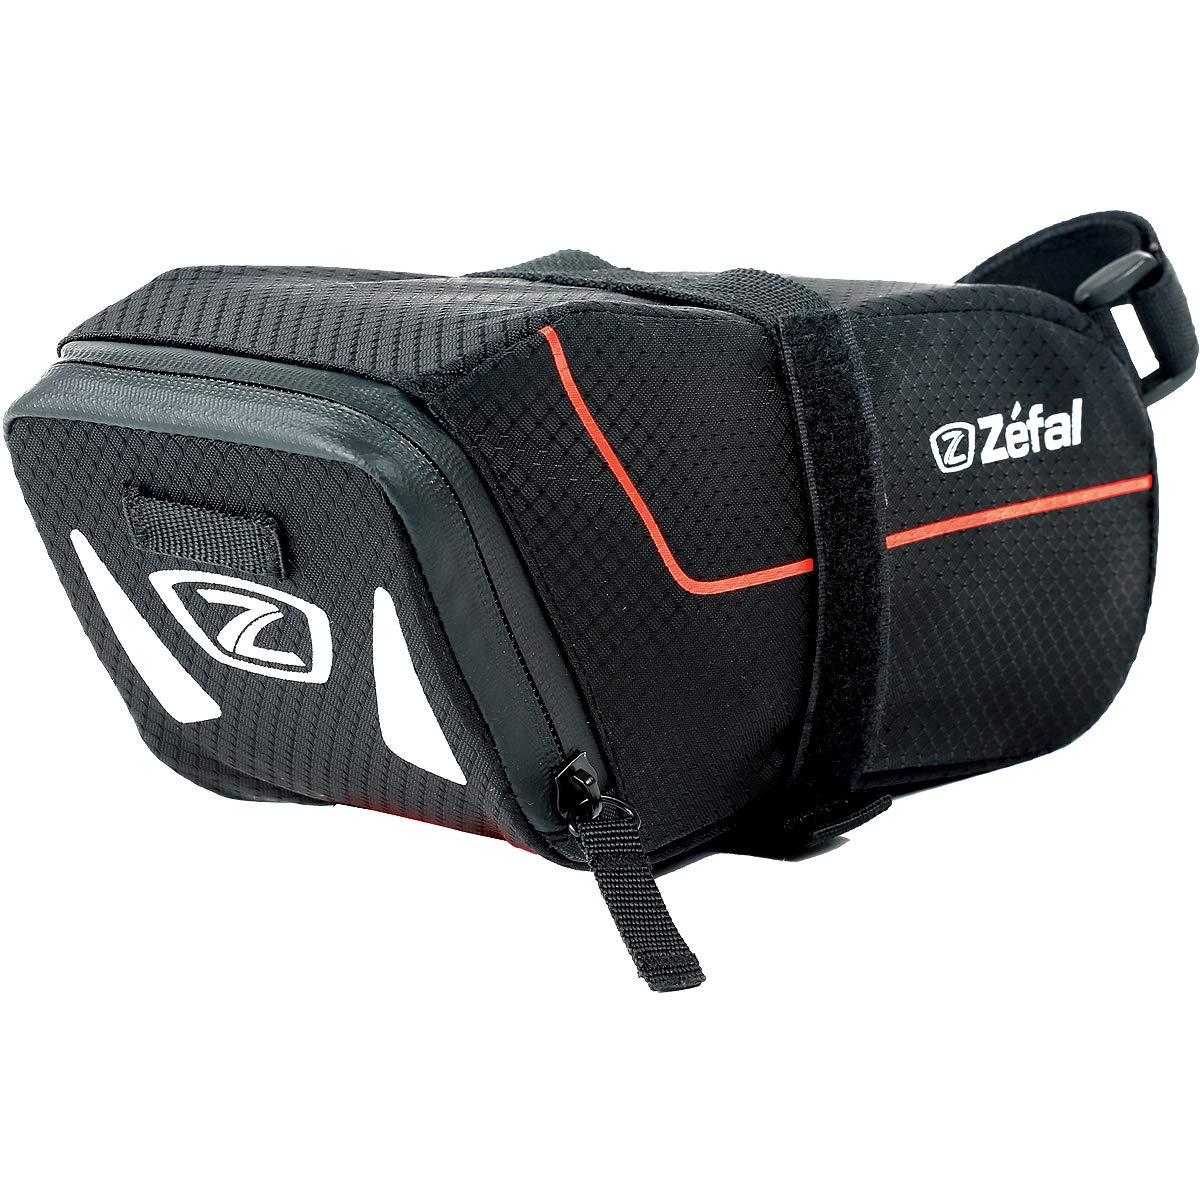 ZEFAL Z Light - Bolsa para sillín de Bicicletas, Color Negro, Talla Large product